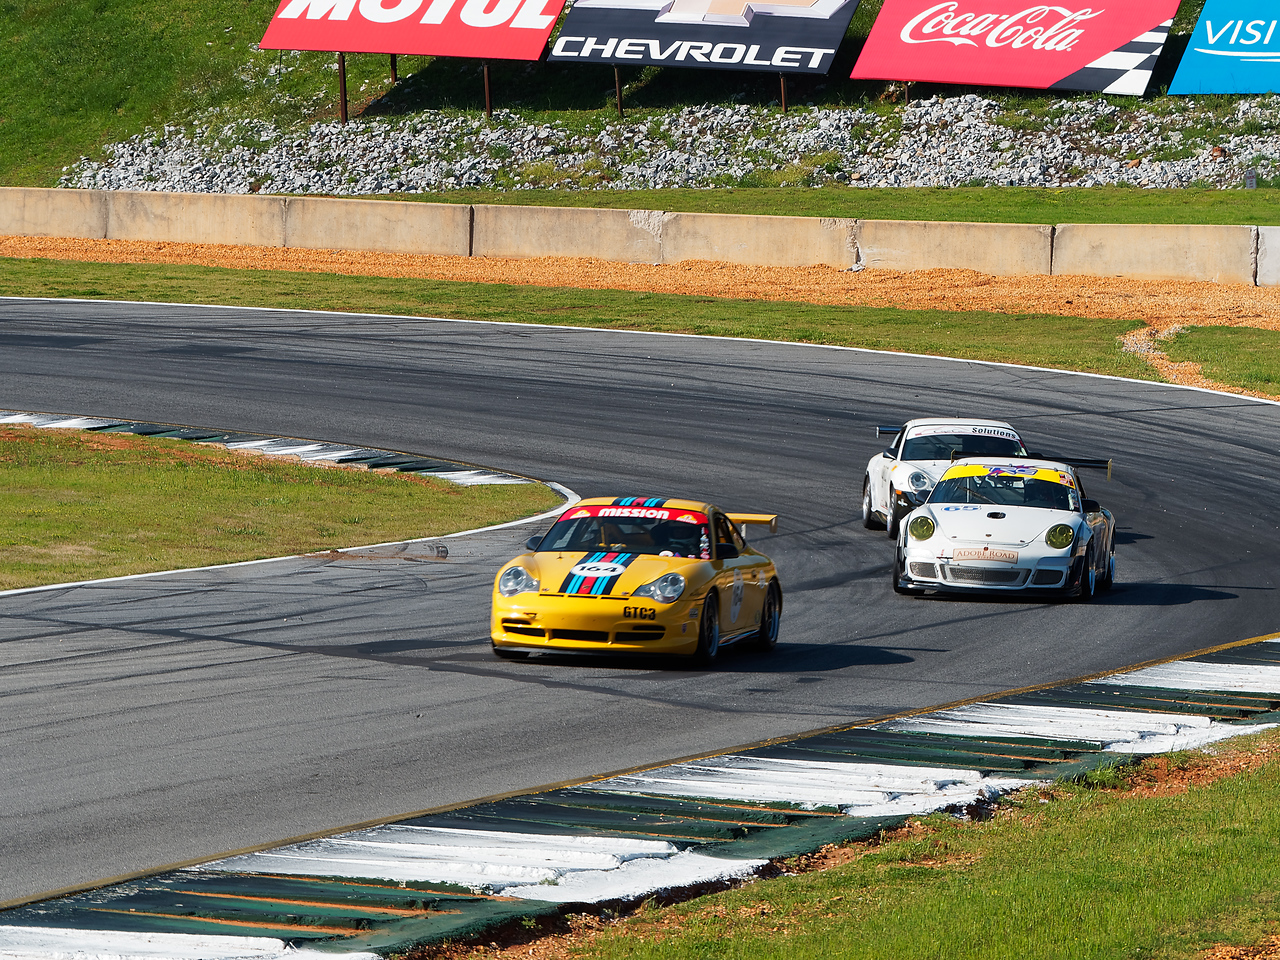 Porsche's pass in review